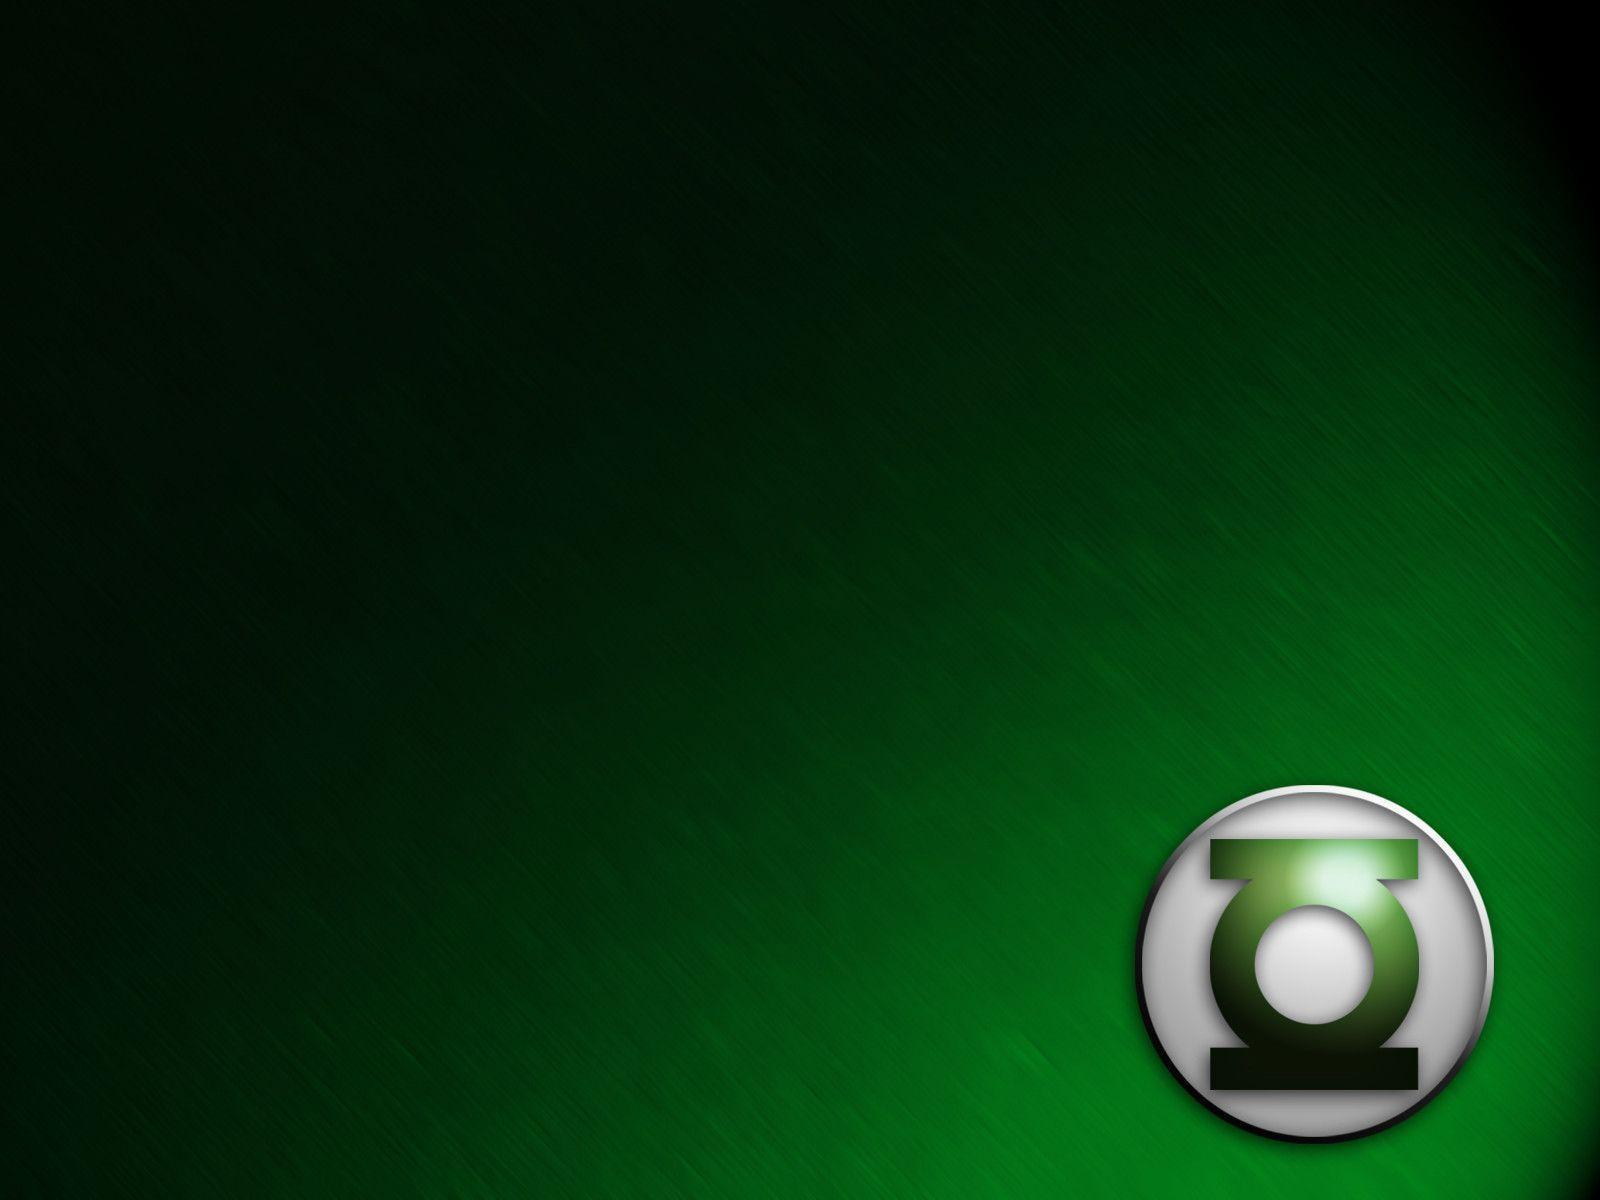 Green Lantern iPhone Wallpaper - WallpaperSafari